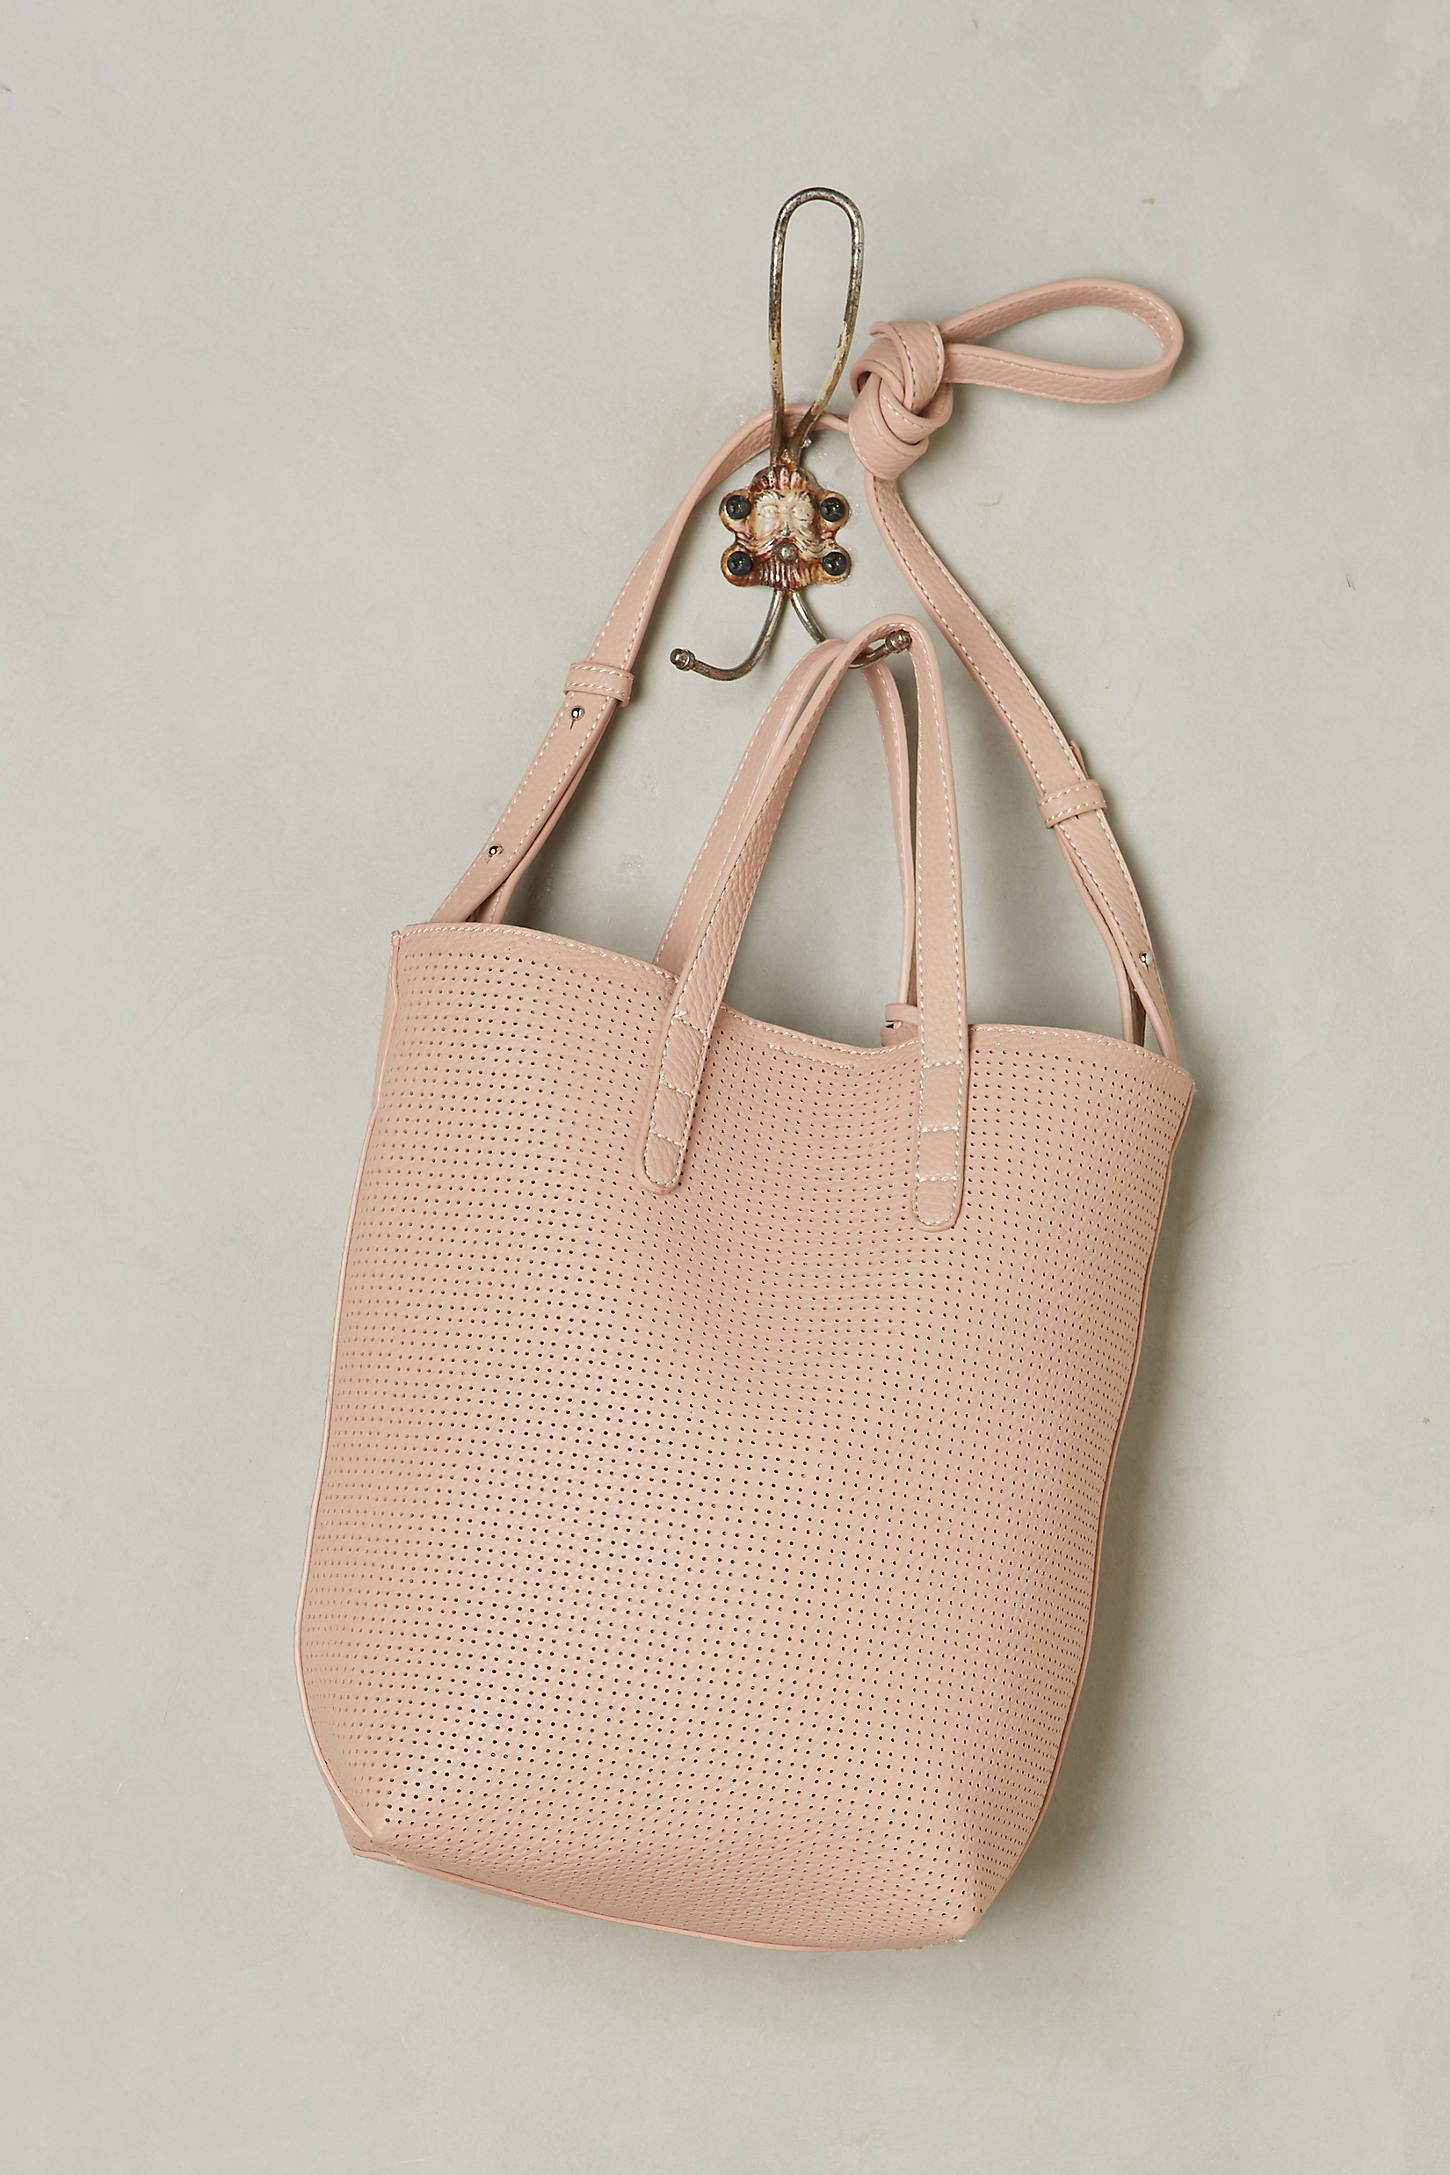 Street Fair Perforated Bag